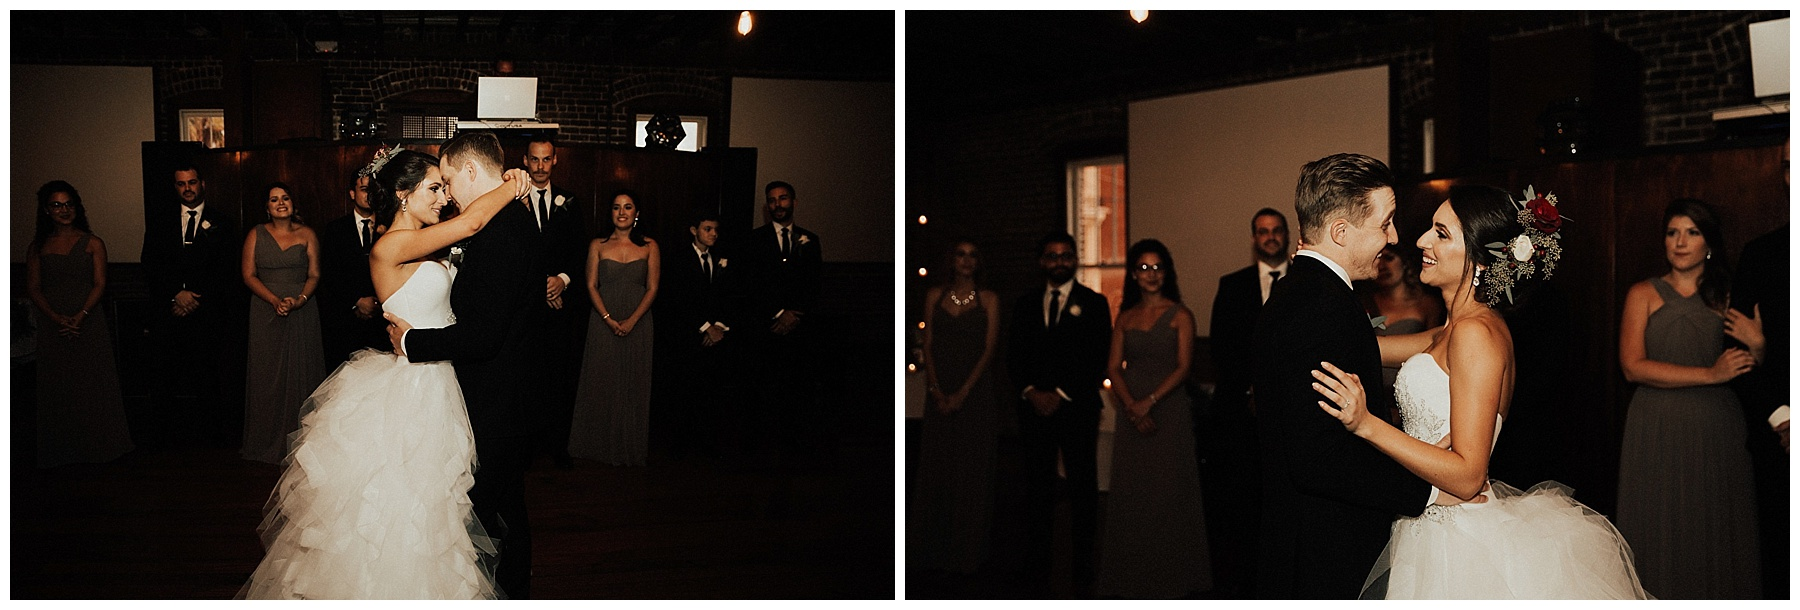 YBOR Wedding Tampa Wedding Photographer-109.jpg